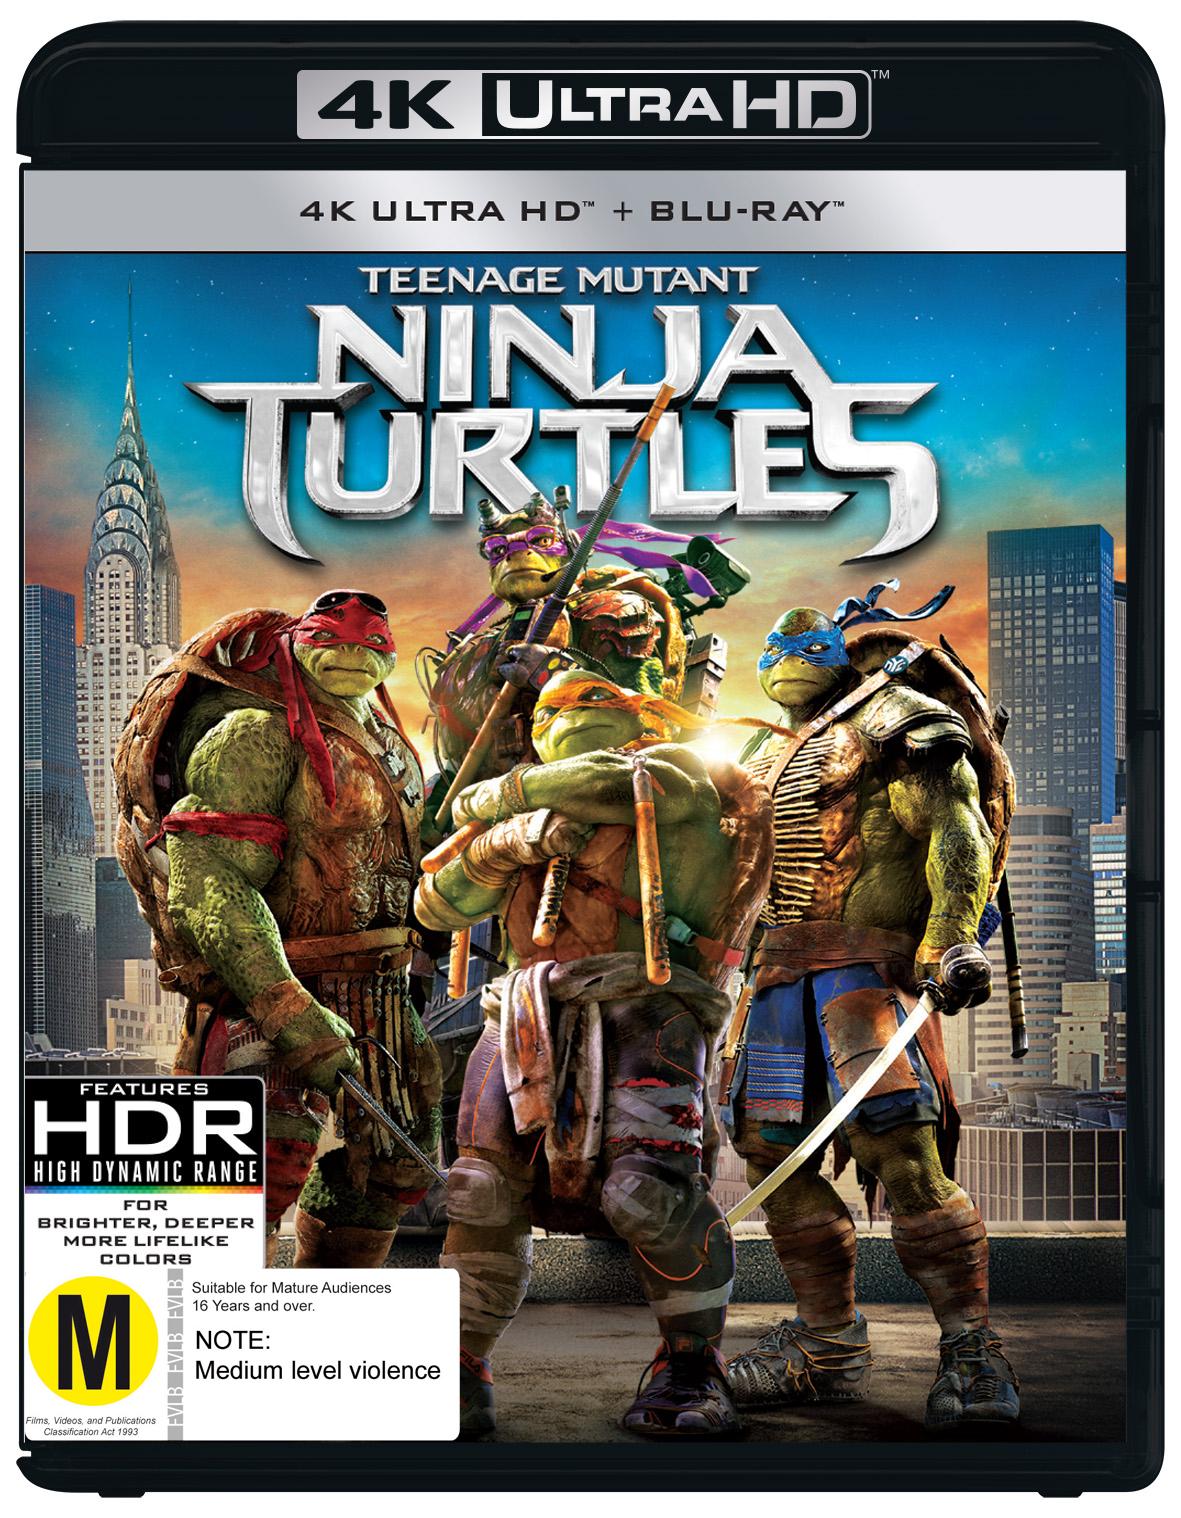 Teenage Mutant Ninja Turtles 2014 Uhd Blu Ray In Stock Buy Now At Mighty Ape Nz